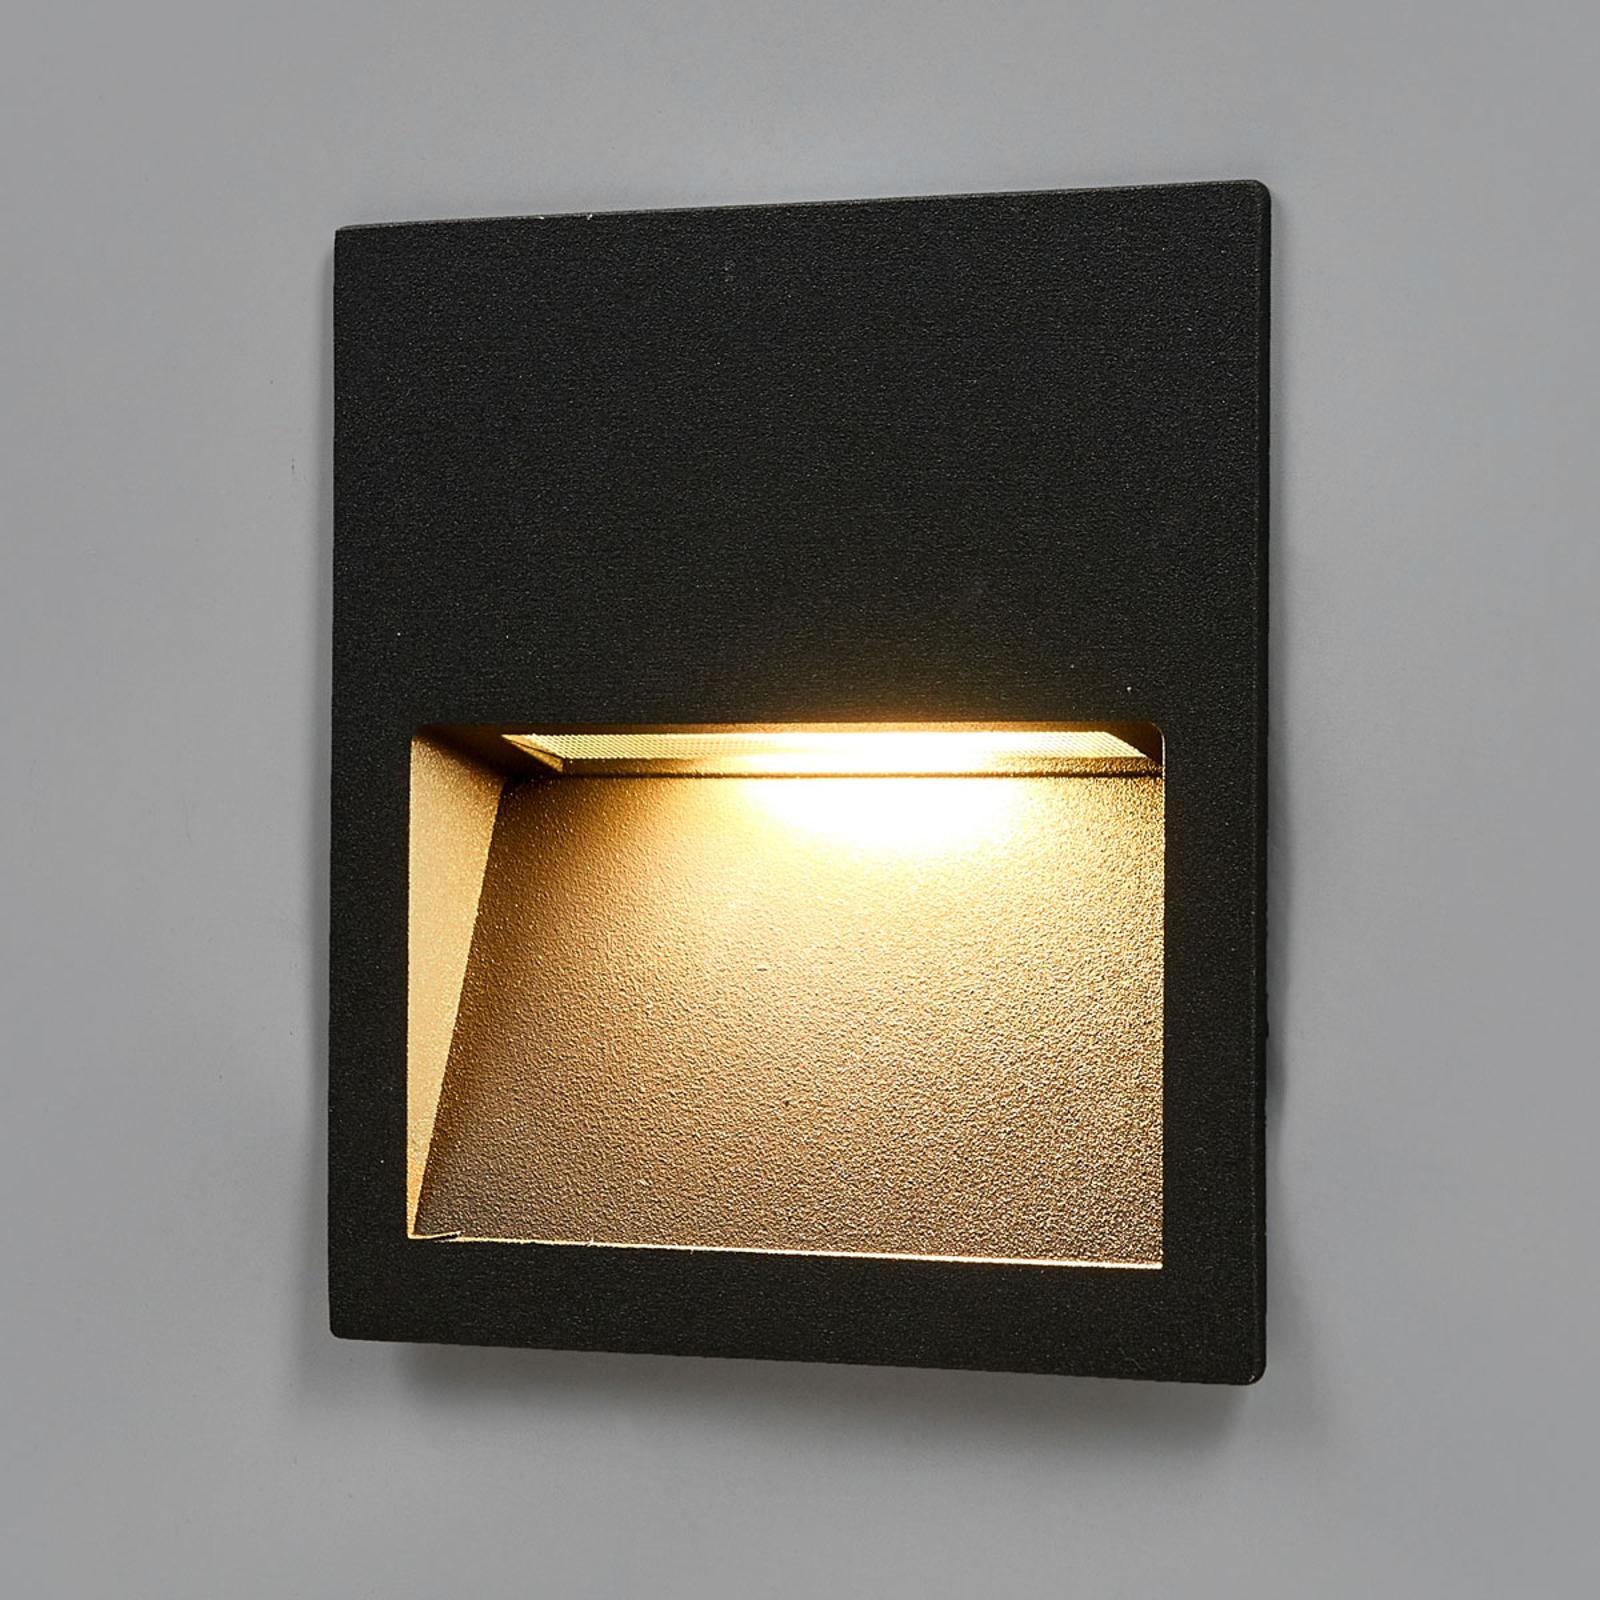 Utebelysning – Många olika utomhuslampor | Lampkultur.se